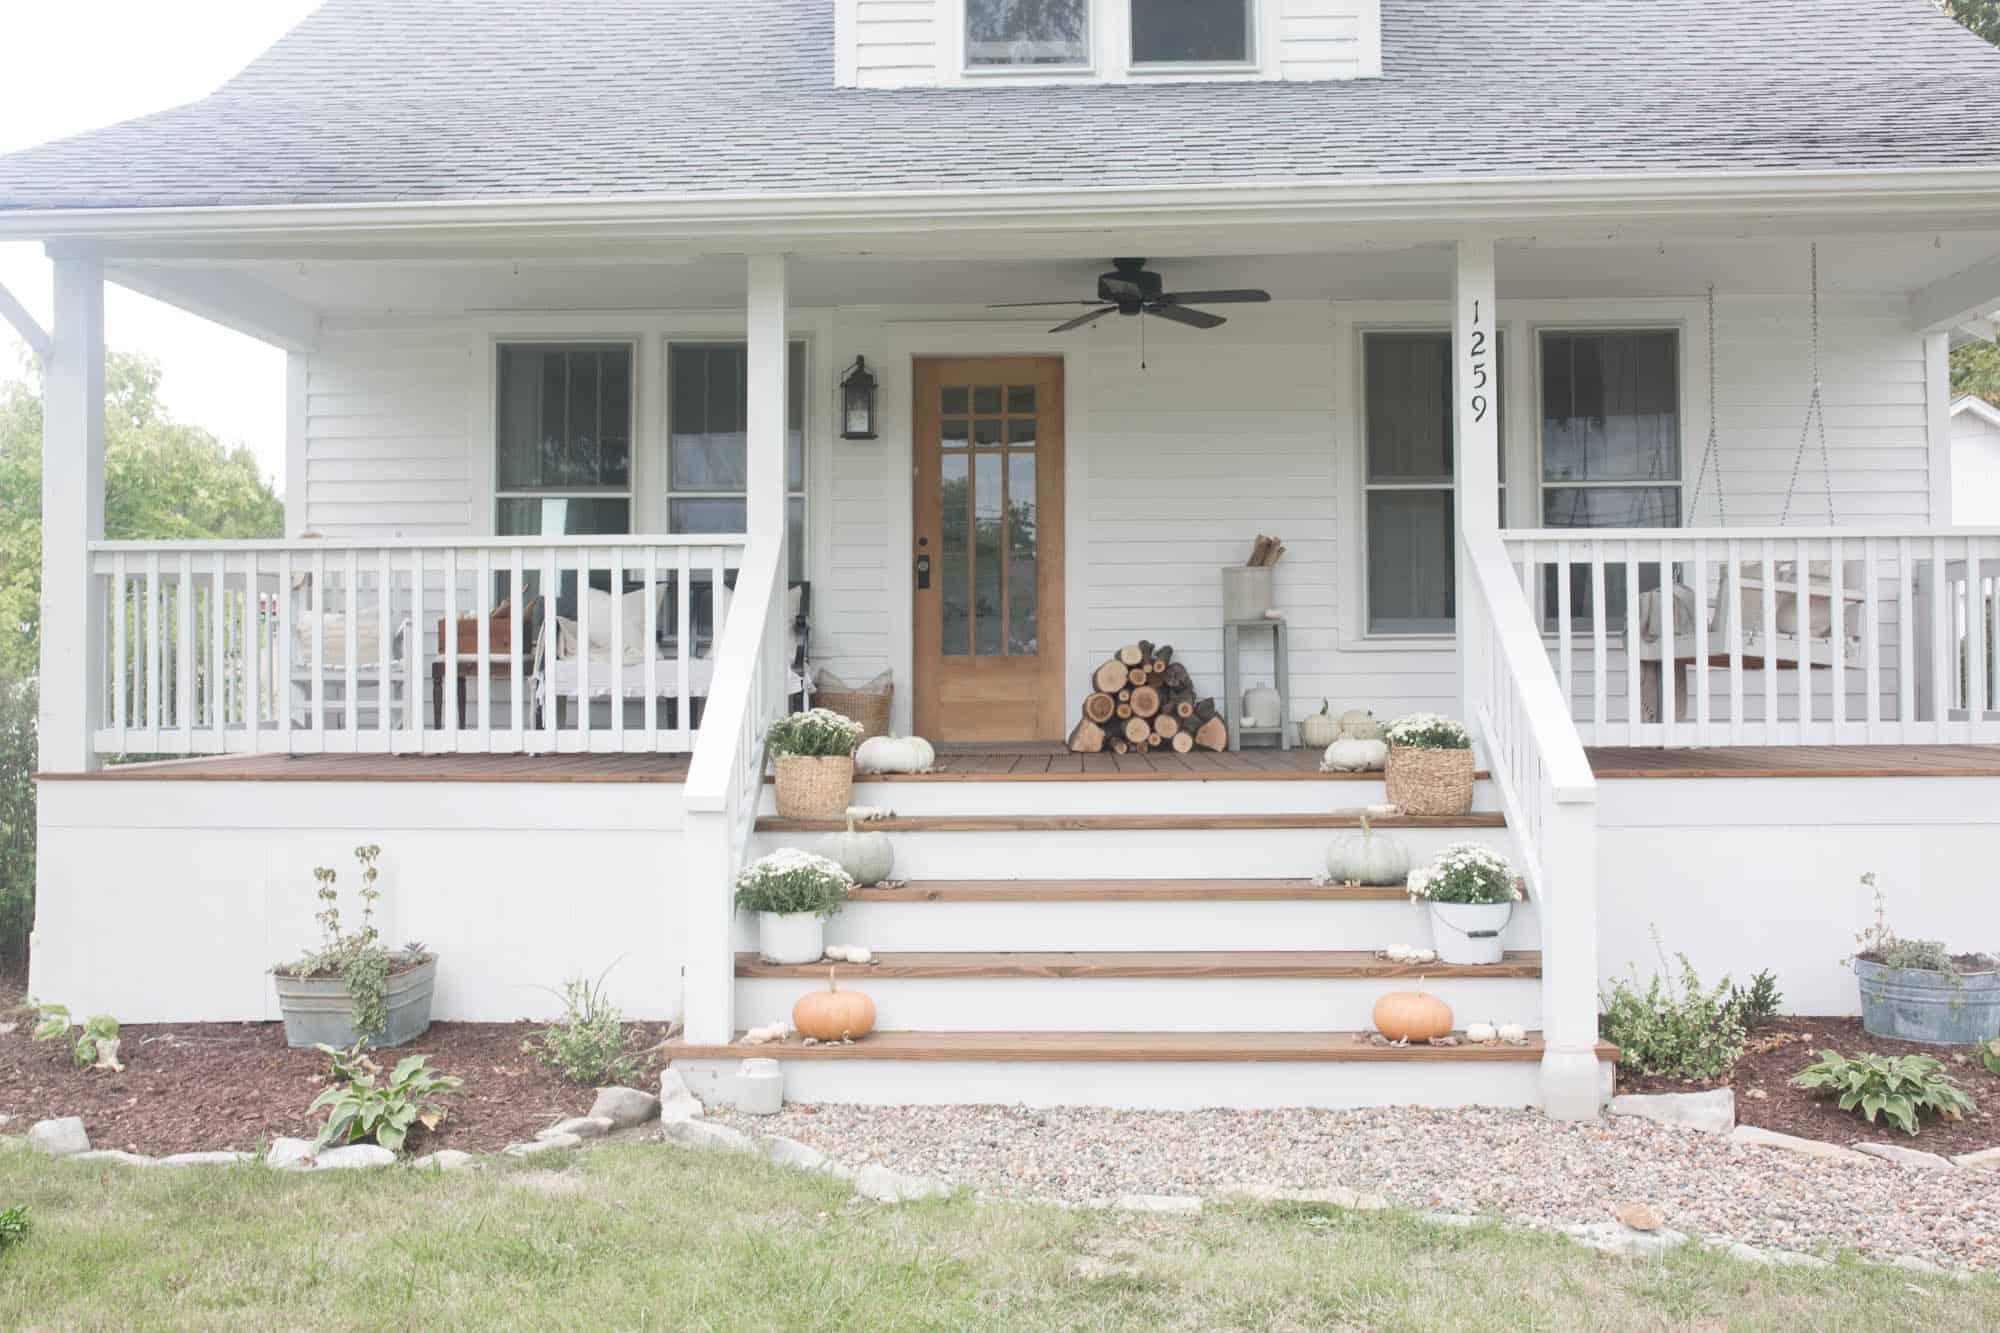 Simple Fall Farmhouse Front Porch Design Ideas from Farmhouse on Boone